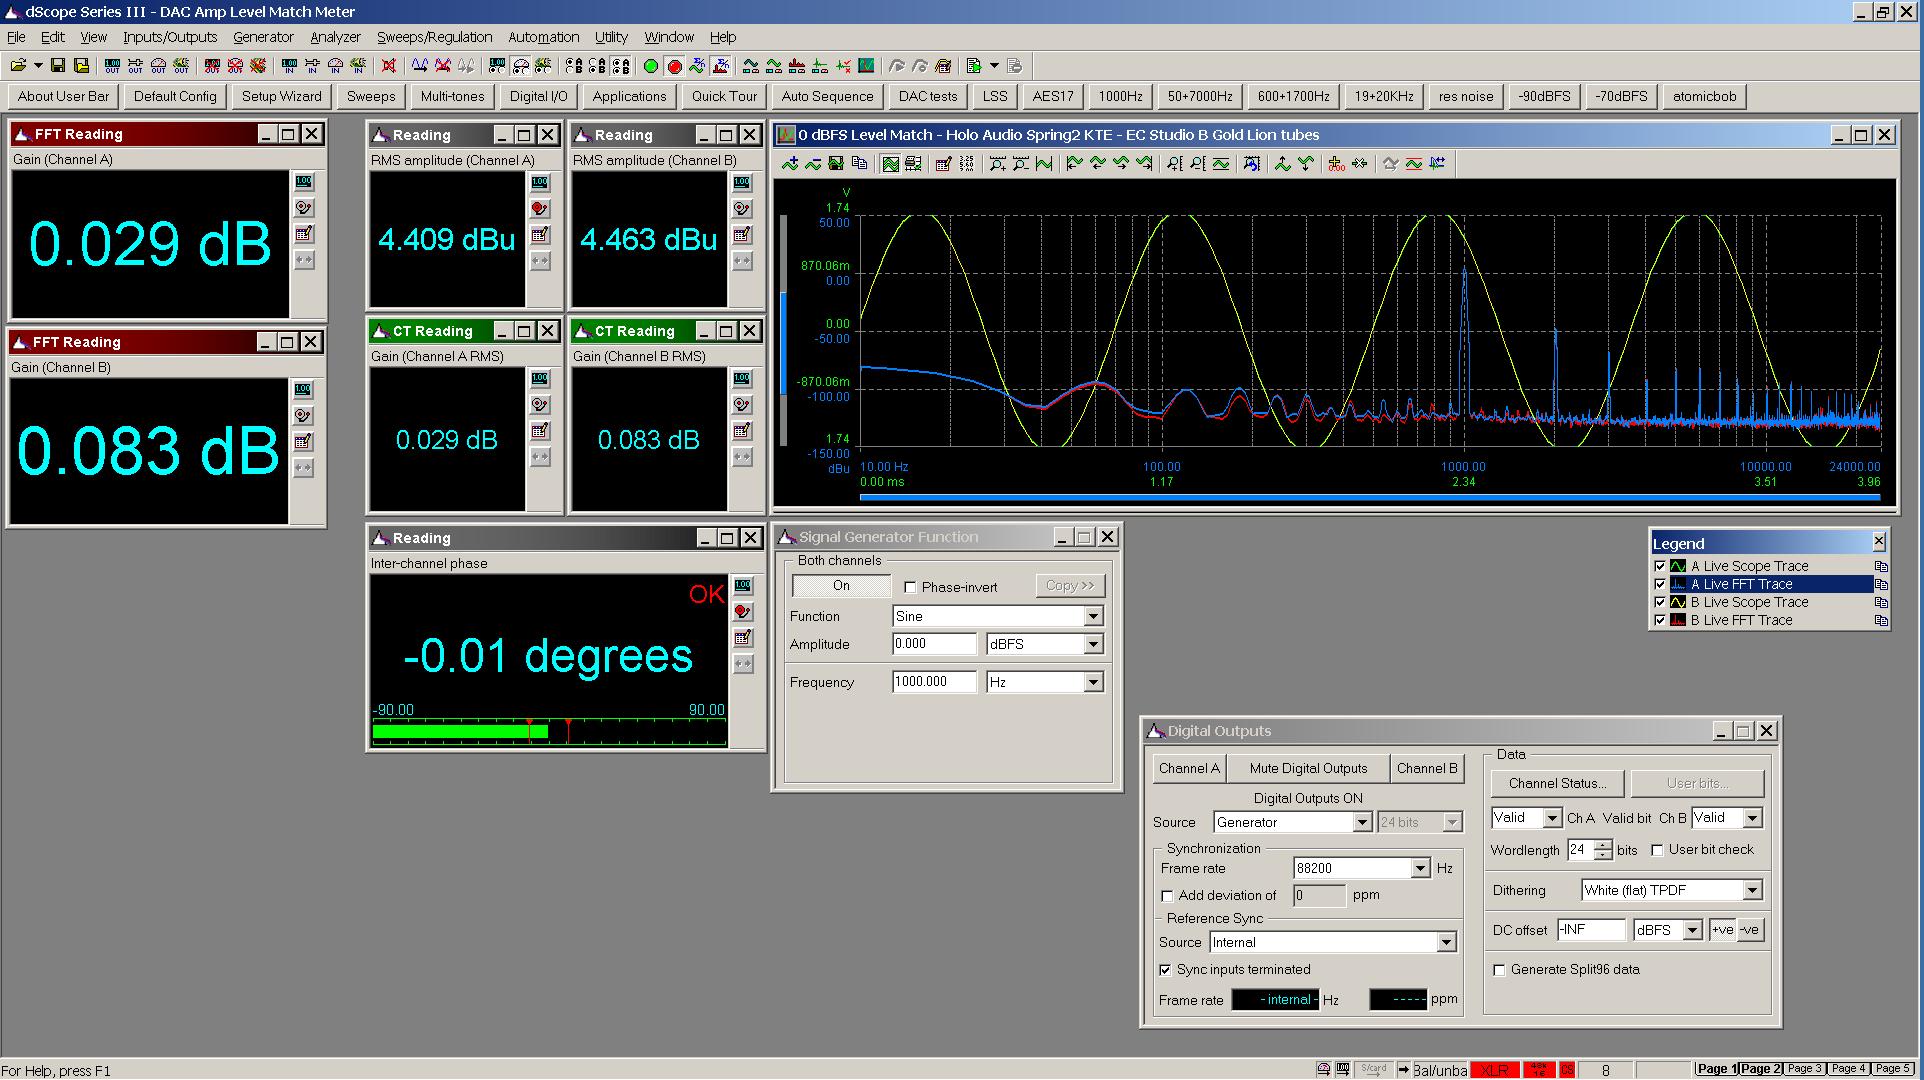 20210513 0dBFS level match EC Studio B - Holo Audio Spring2 KTE.png